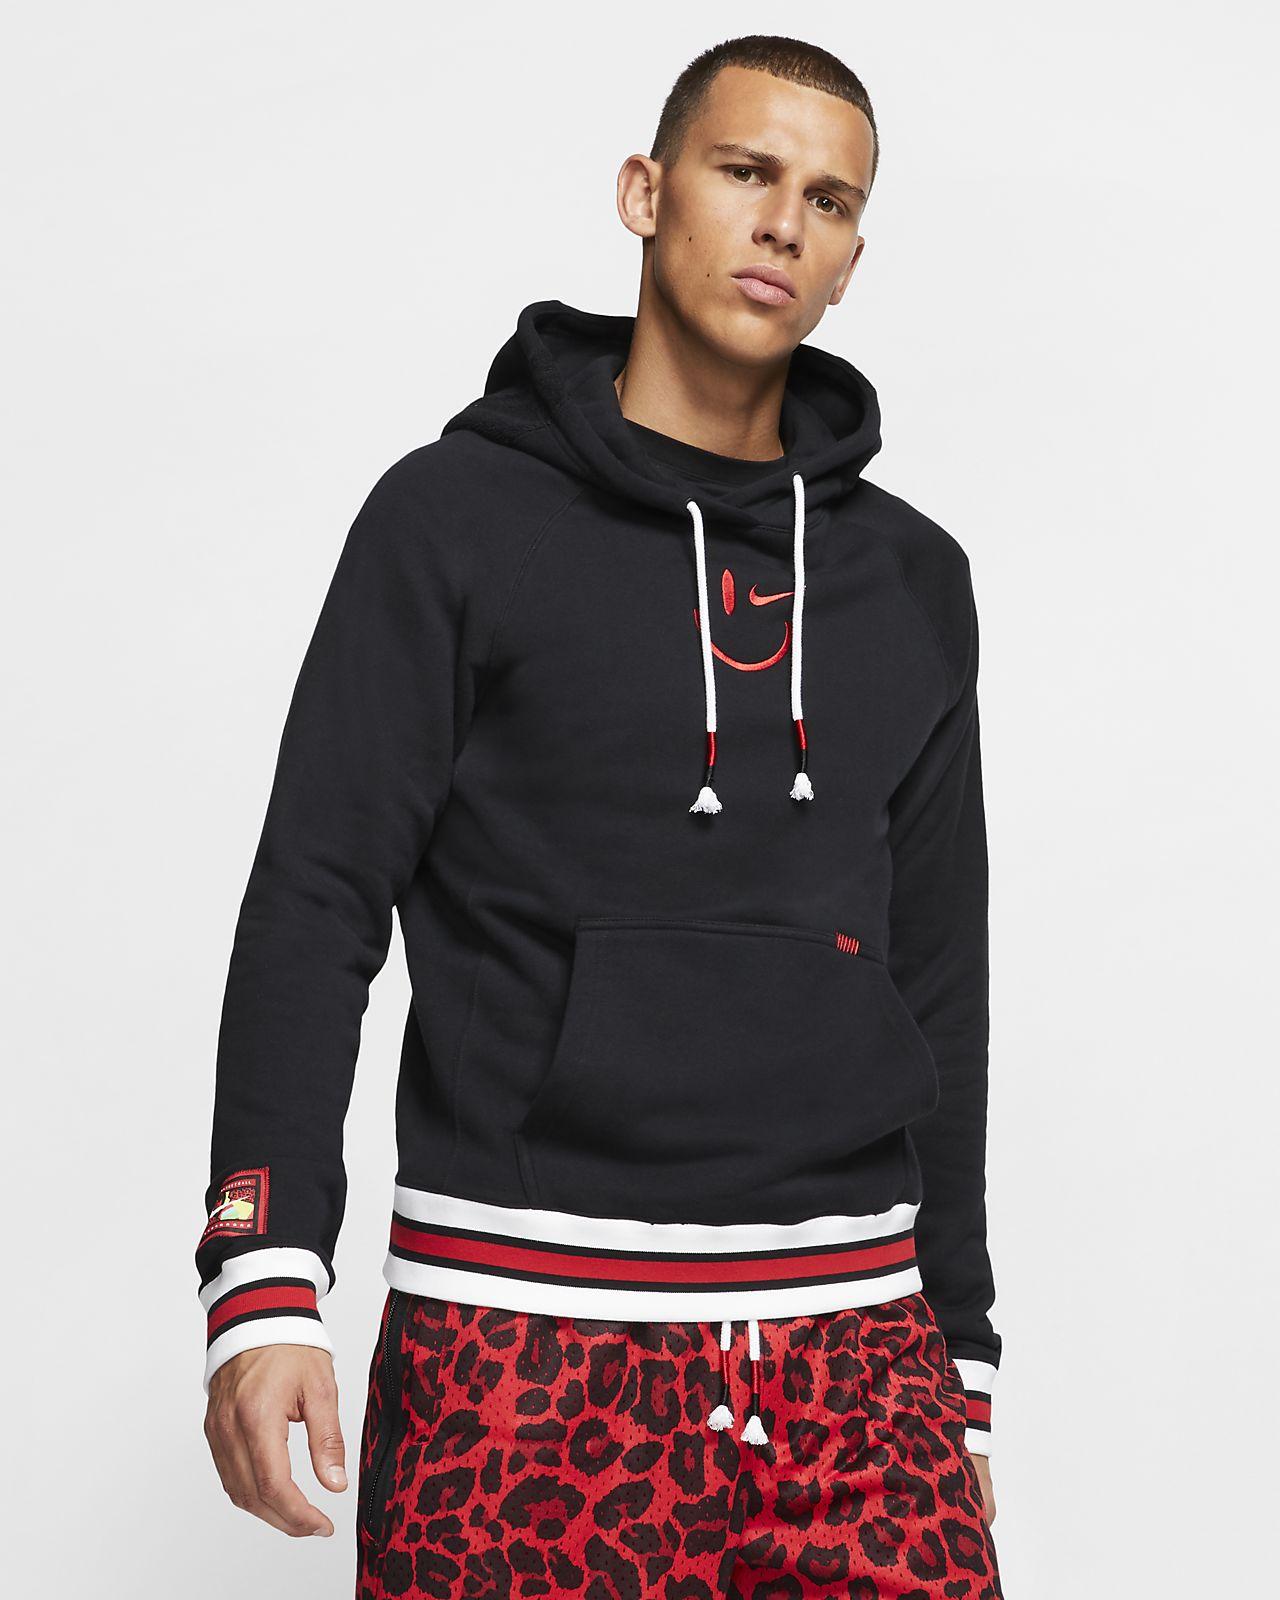 Sudadera con capucha de básquetbol para hombre Nike